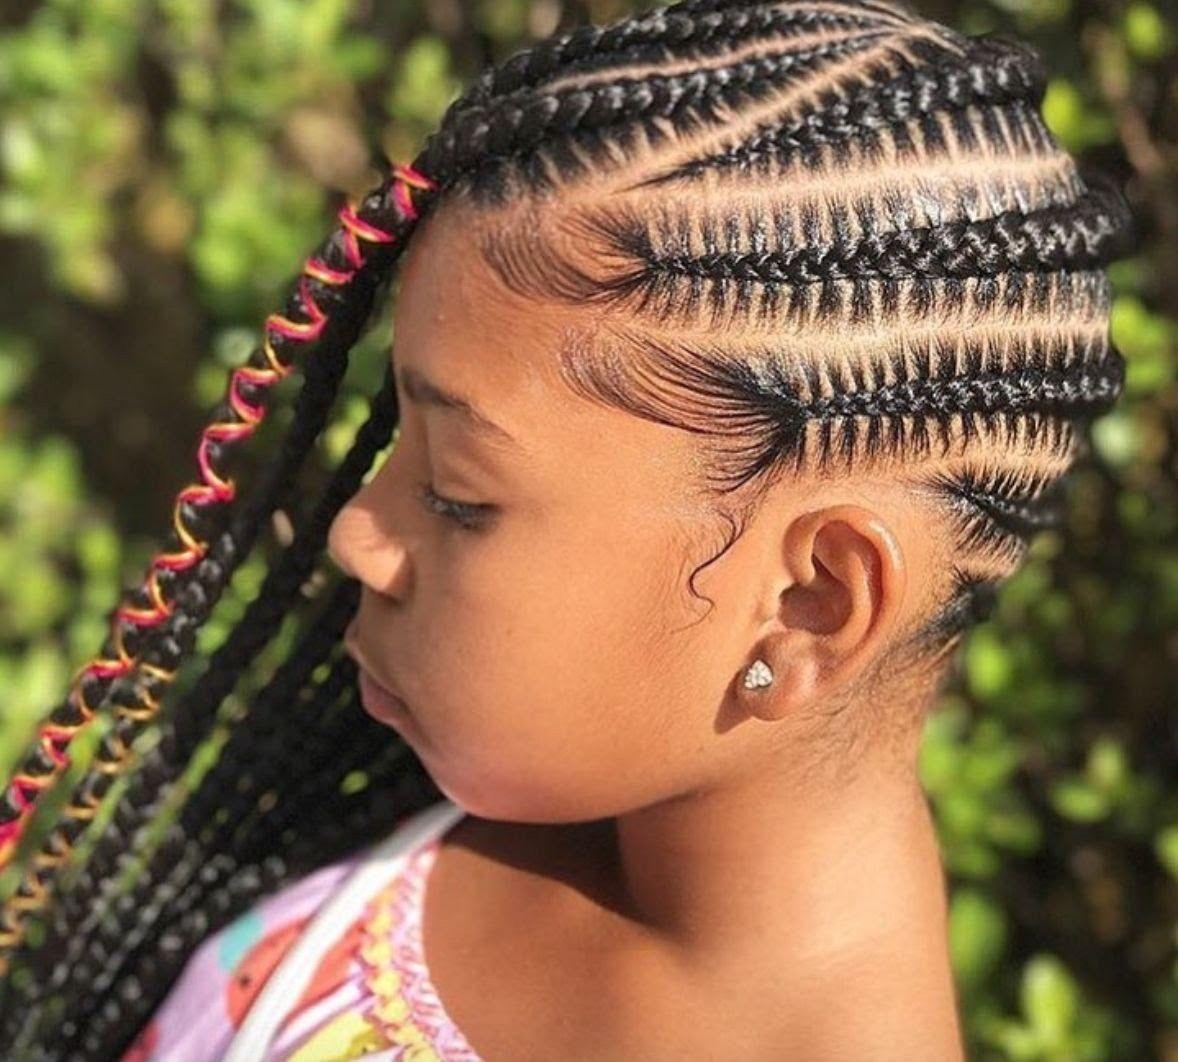 Follow Vinaksena مجد Black Kids Braids Hairstyles Natural Hairstyles For Kids Kids Braided Hairstyles